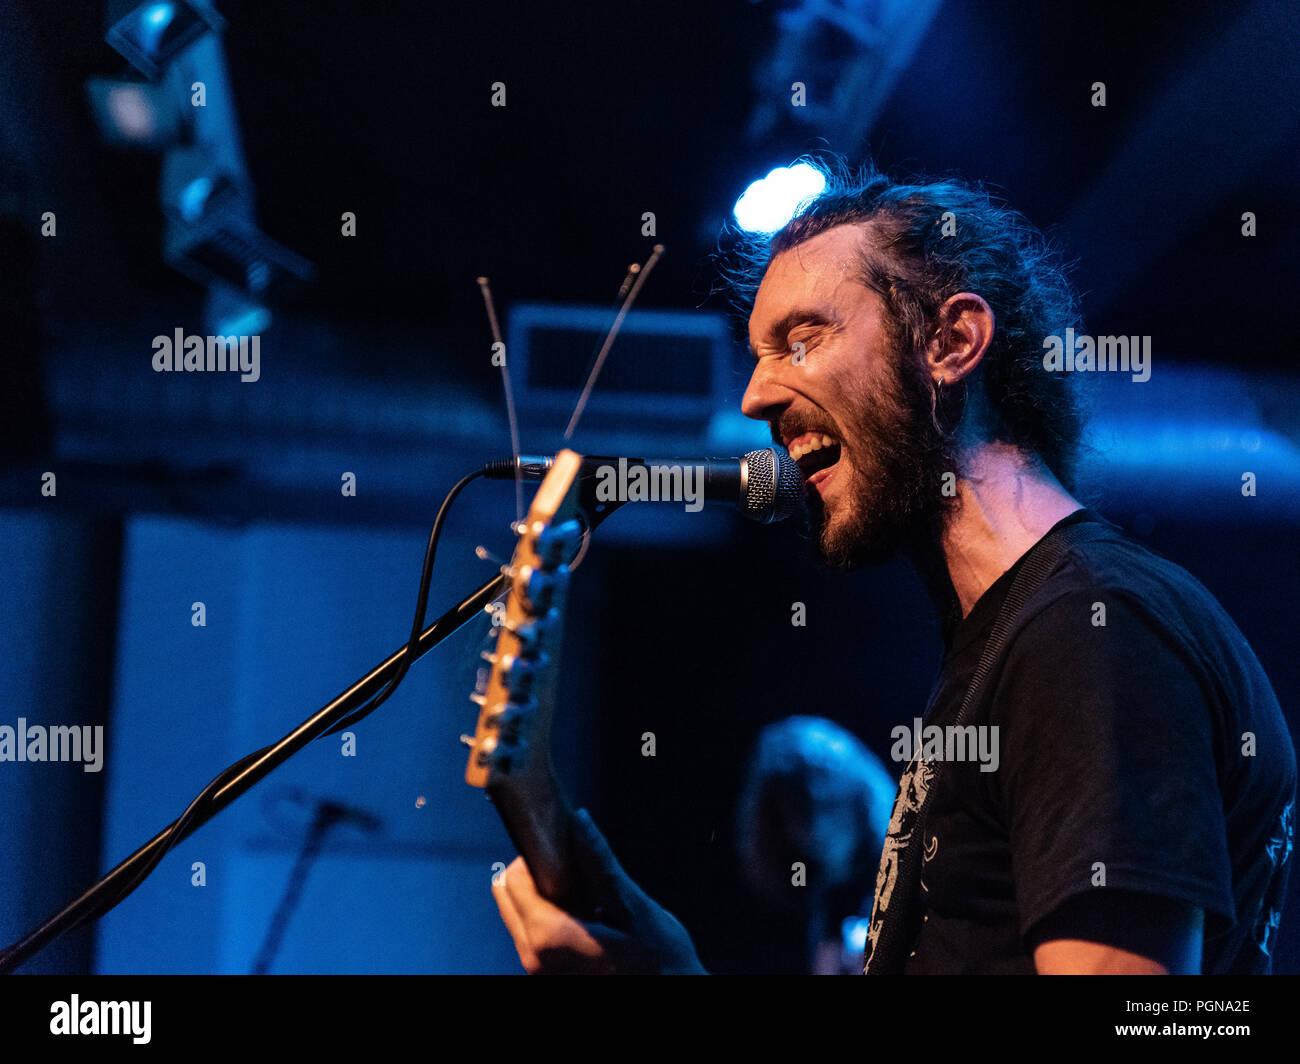 Bergamo, Italy - August 26, 2018: Italian Grunge-St0ner band Adrenalin Dose performs at Pollo Metal Fest at Spazio Polaresco (BG). Brambilla Simone Li - Stock Image